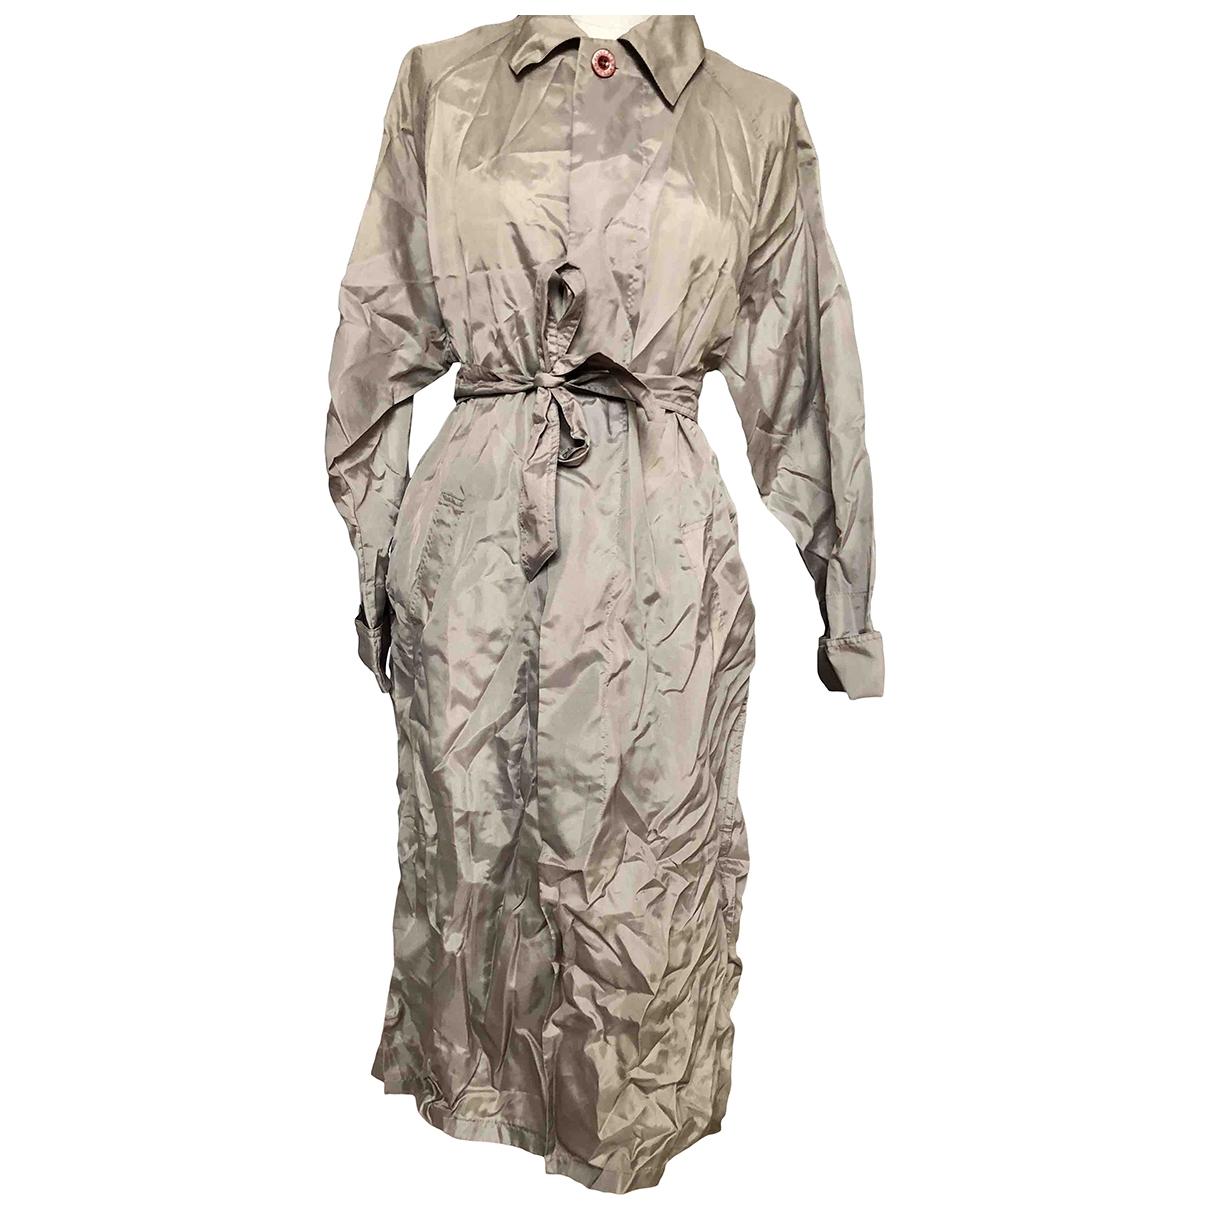 Longchamp \N Khaki Trench coat for Women XS International